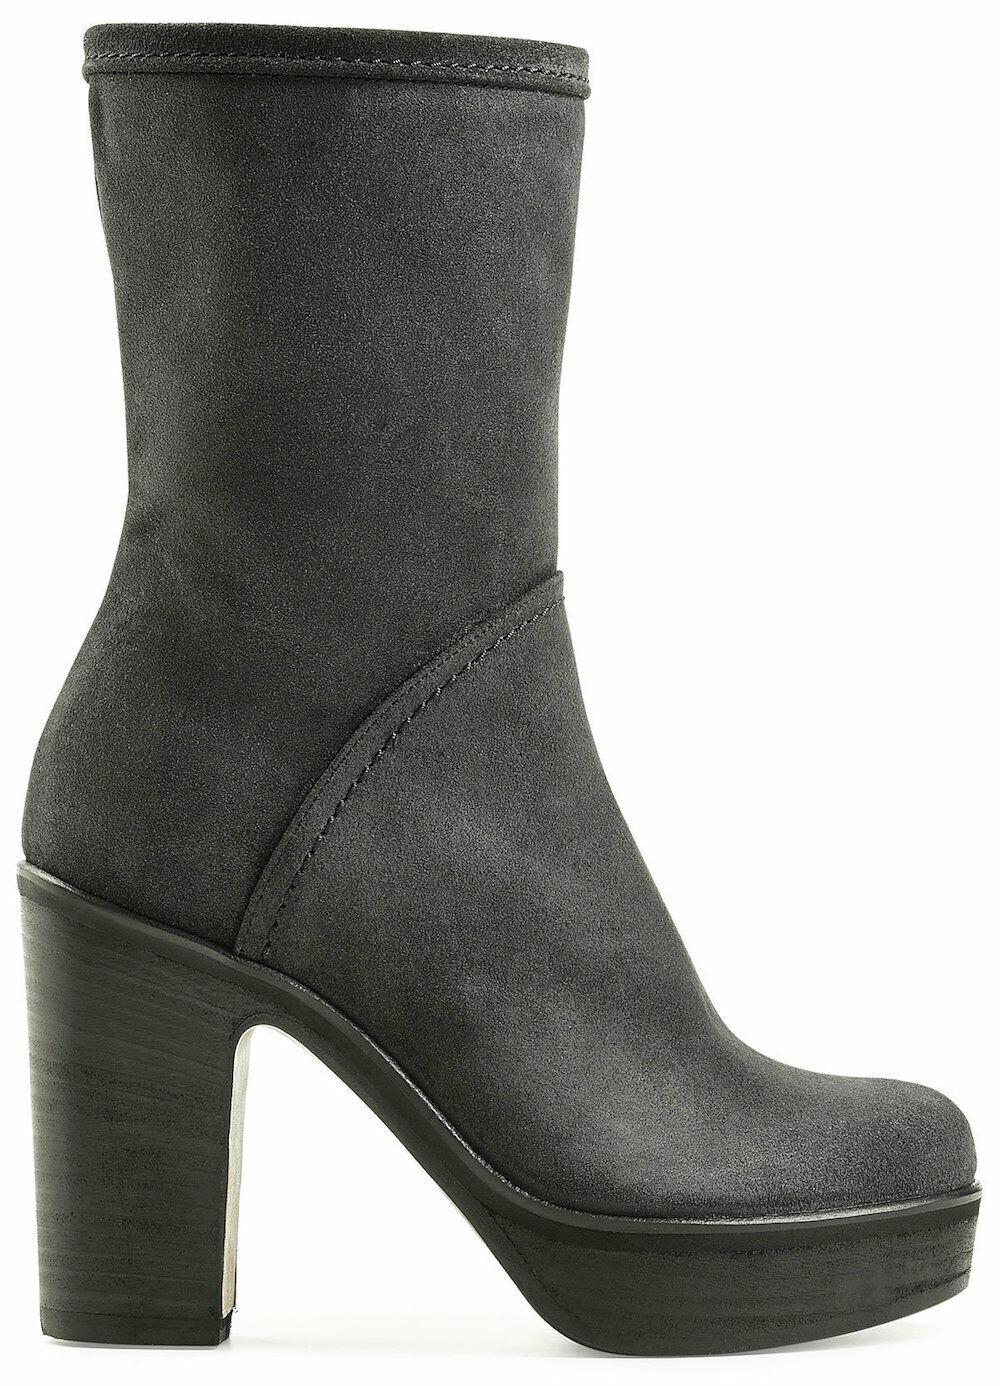 Fiorentini + Baker señora botas Baby bronx Platform botas zapatos 561